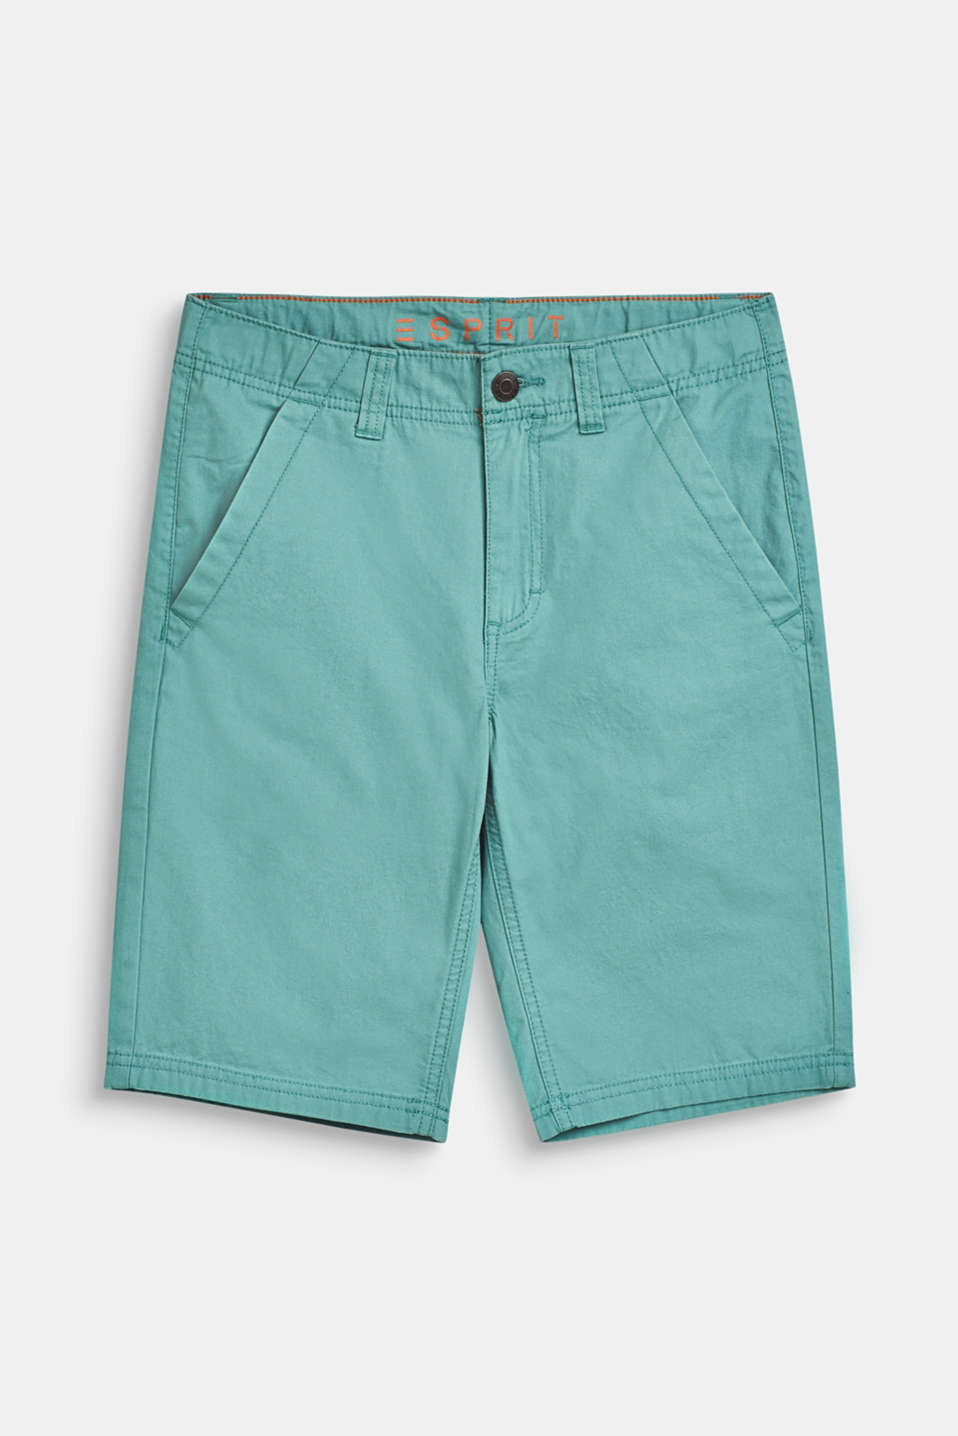 Bermuda shorts in 100% cotton, LCSOFT GREEN, detail image number 0